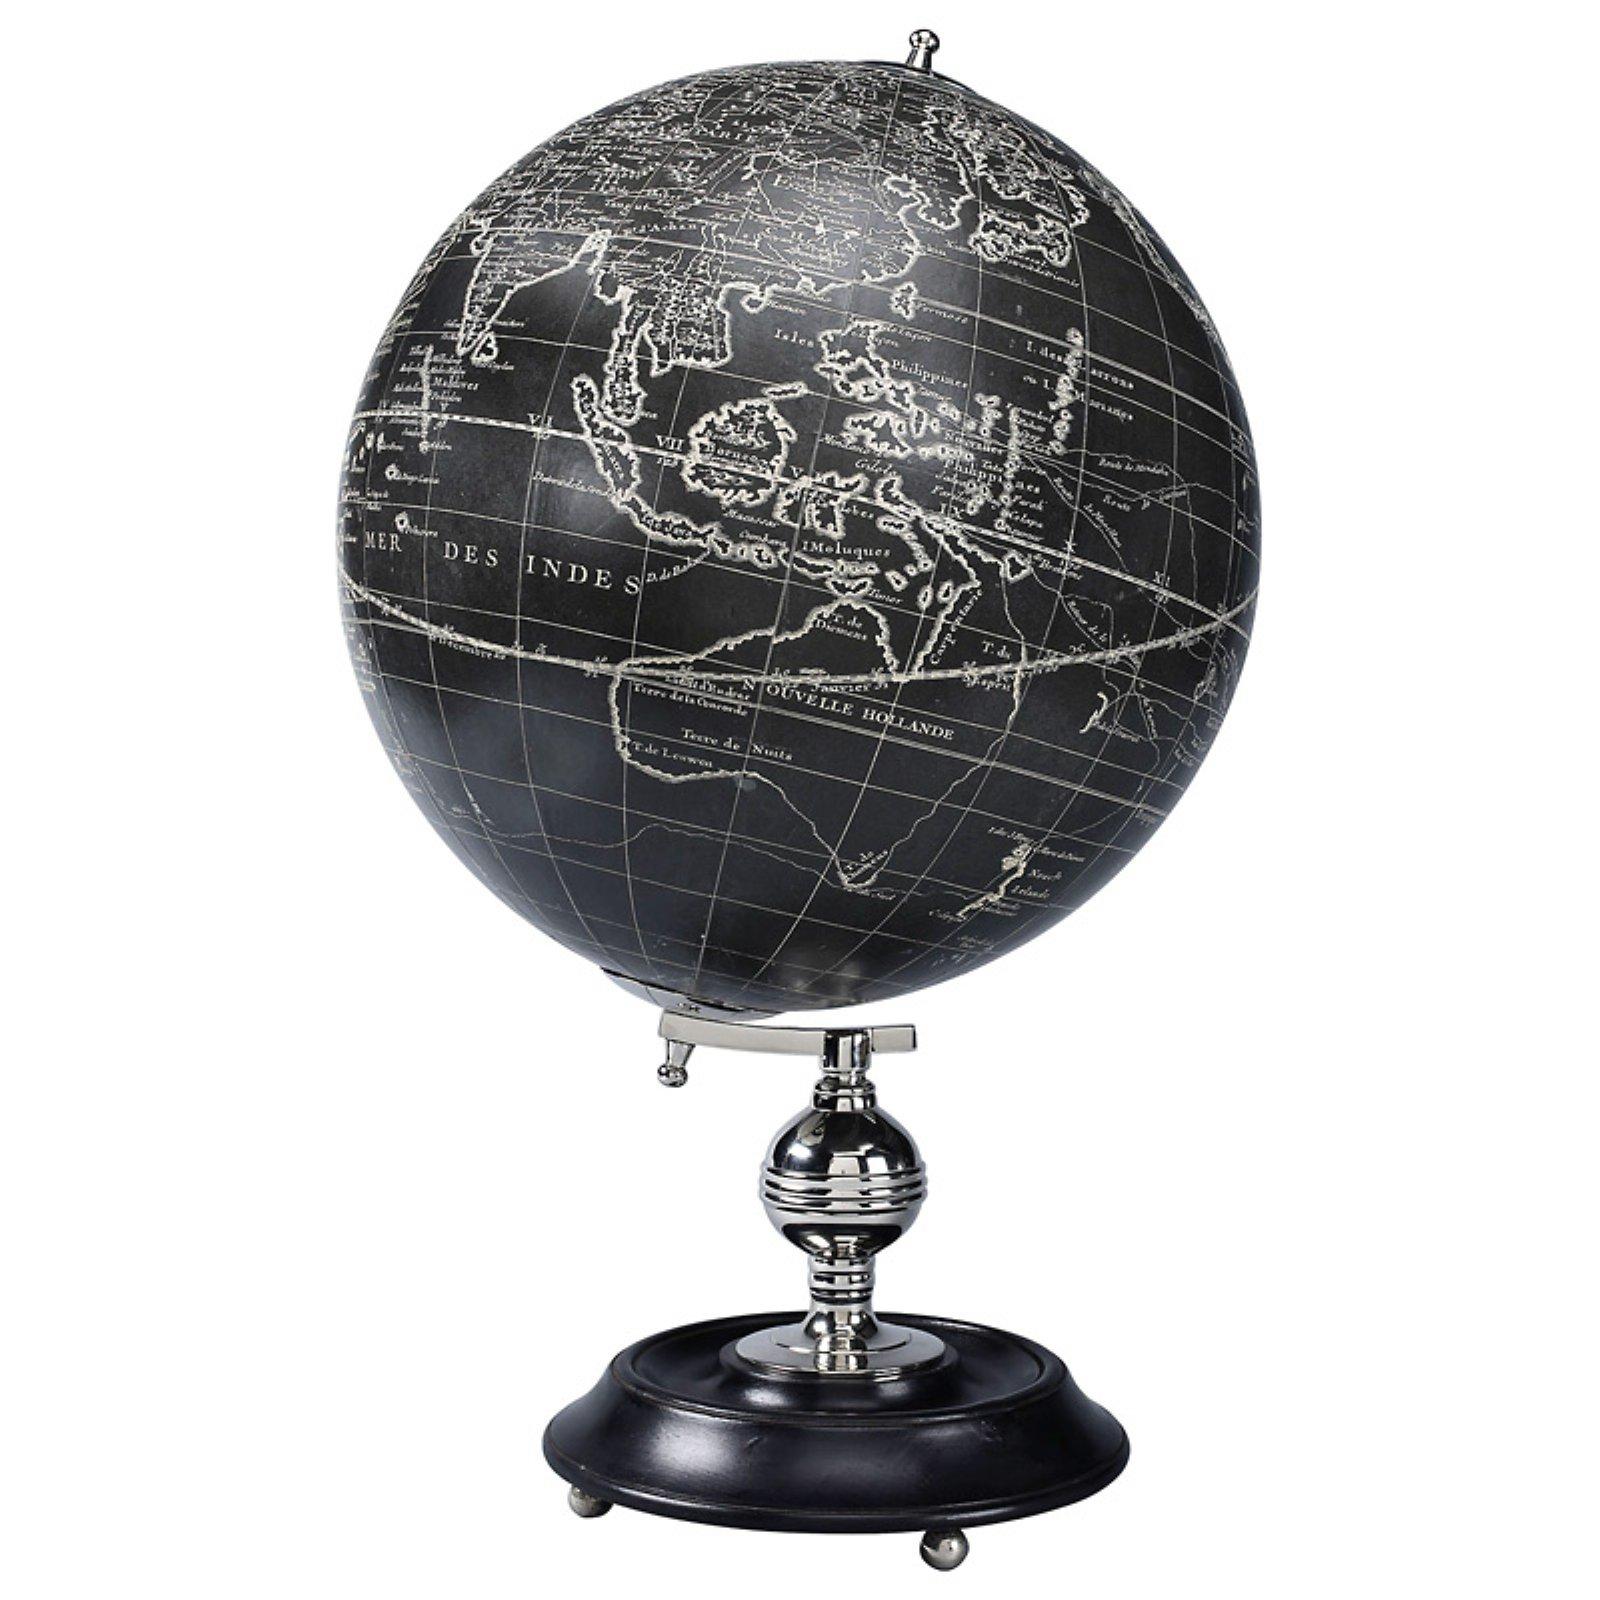 Authentic Models Vaugondy 1745 12.75-Inch Diameter Tabletop Globe